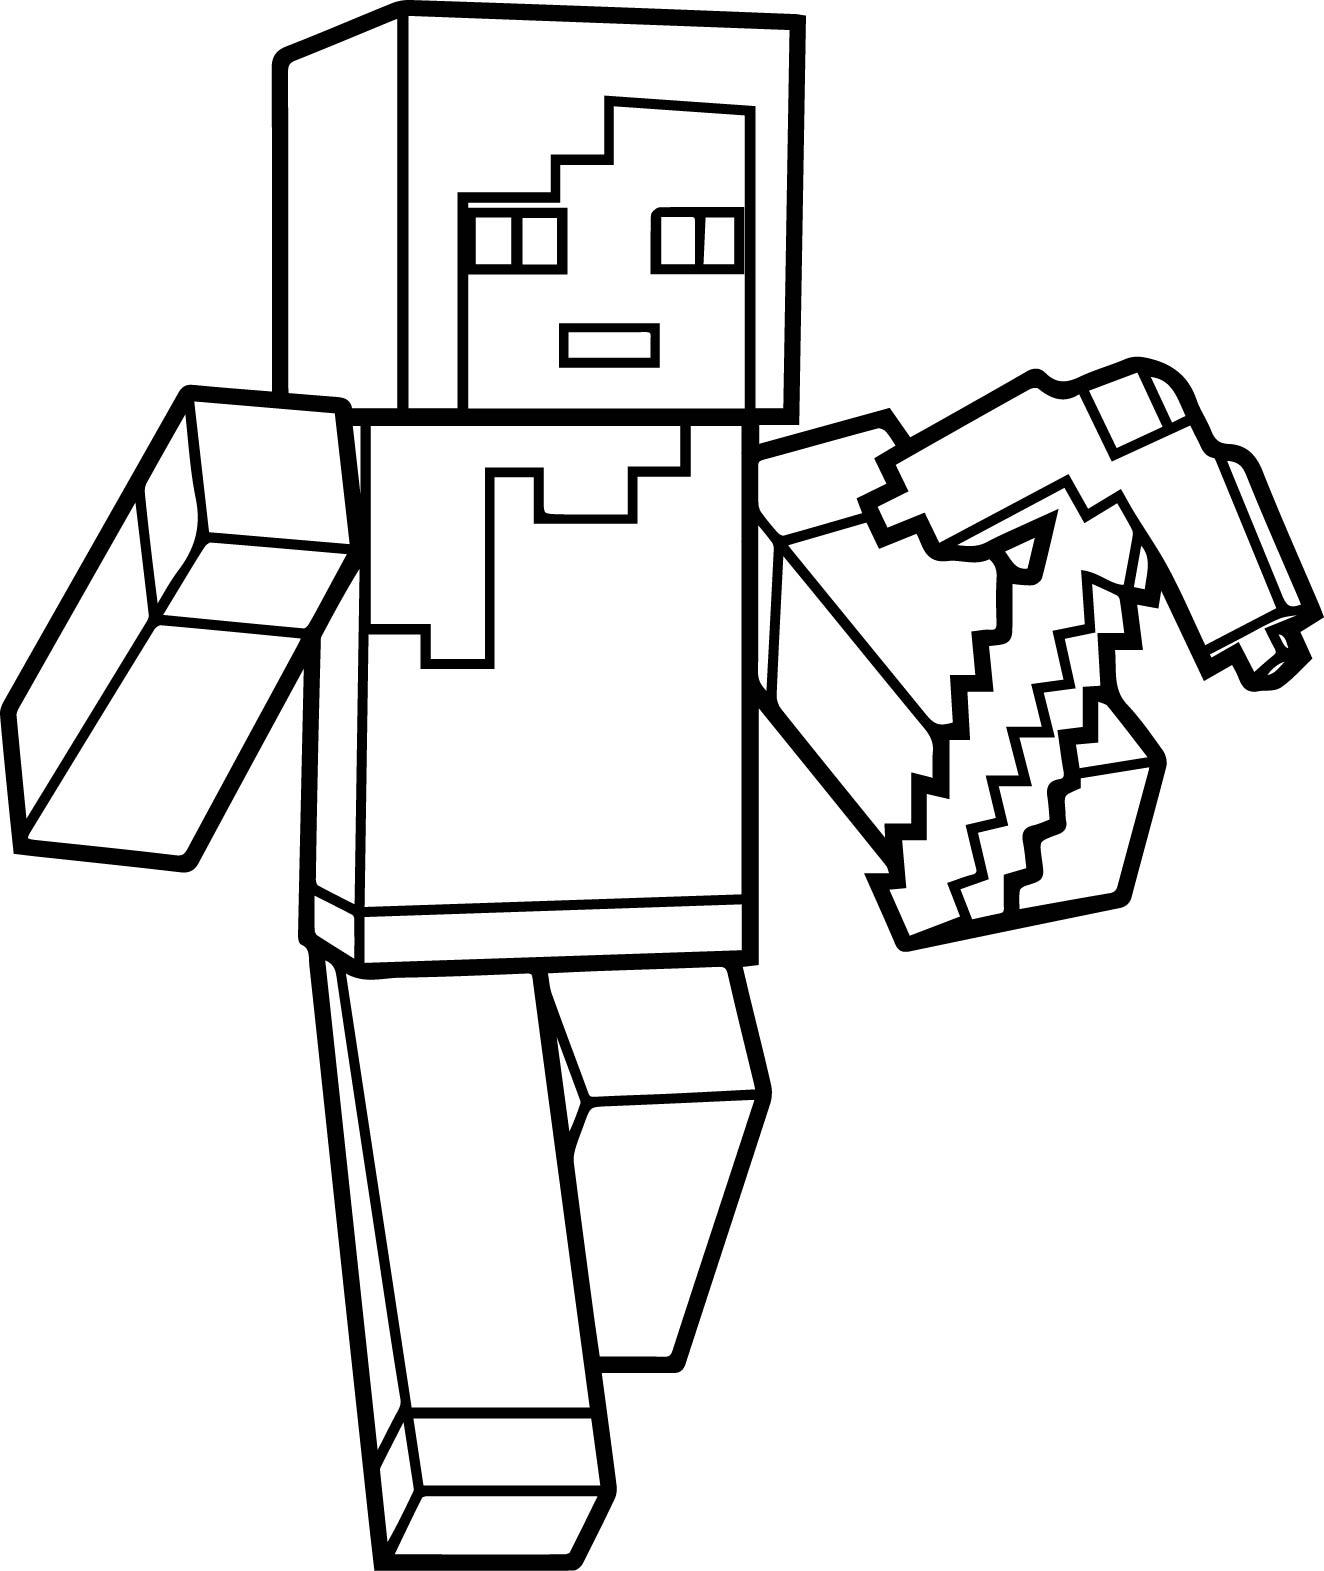 desenhos para colorir minecraft para imprimir qt09 ivango